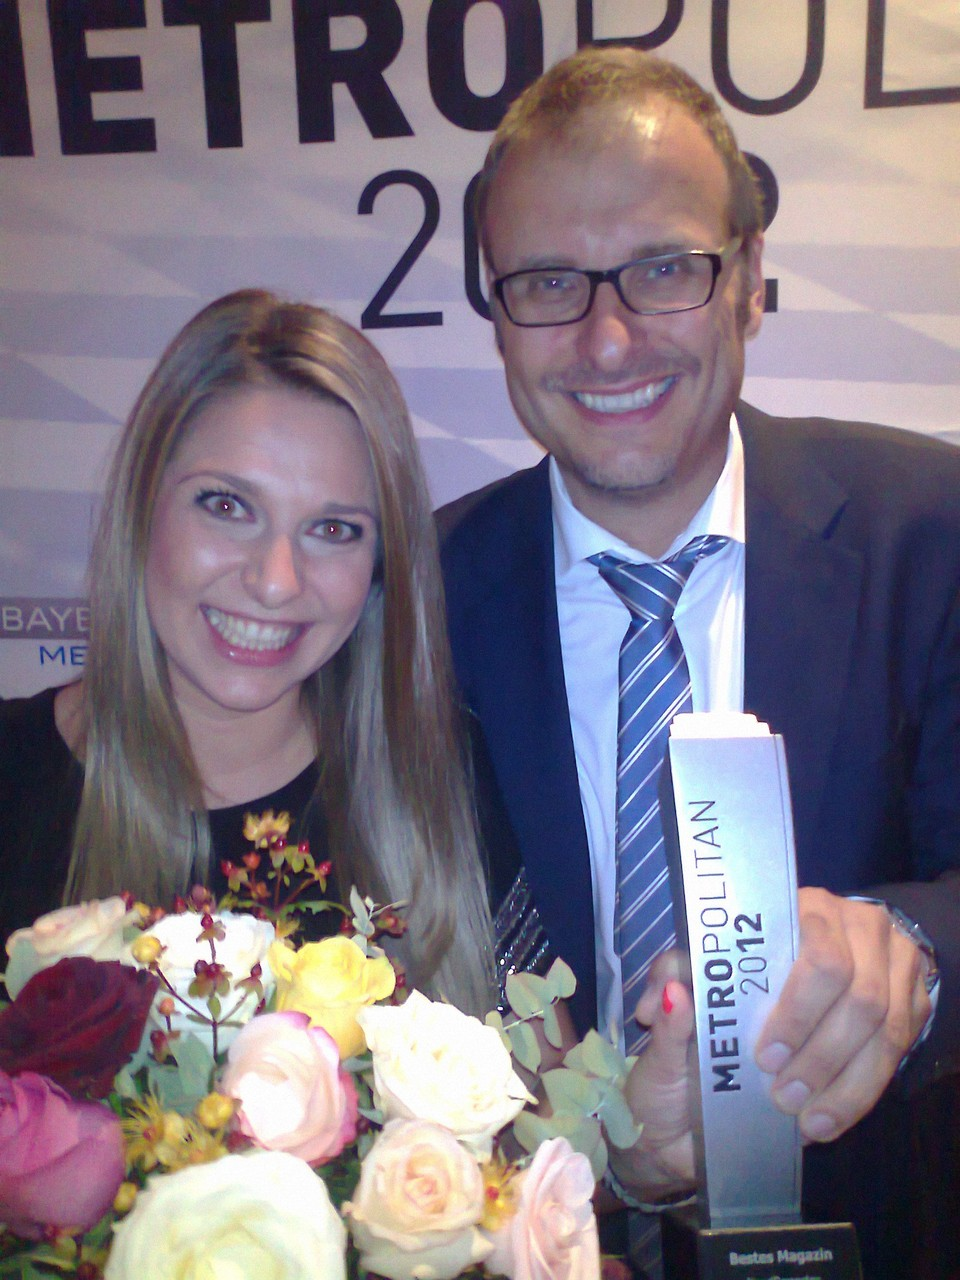 Gewinn des Metropolitan 2012 mit Moderatorenkollegin Julia Gypas